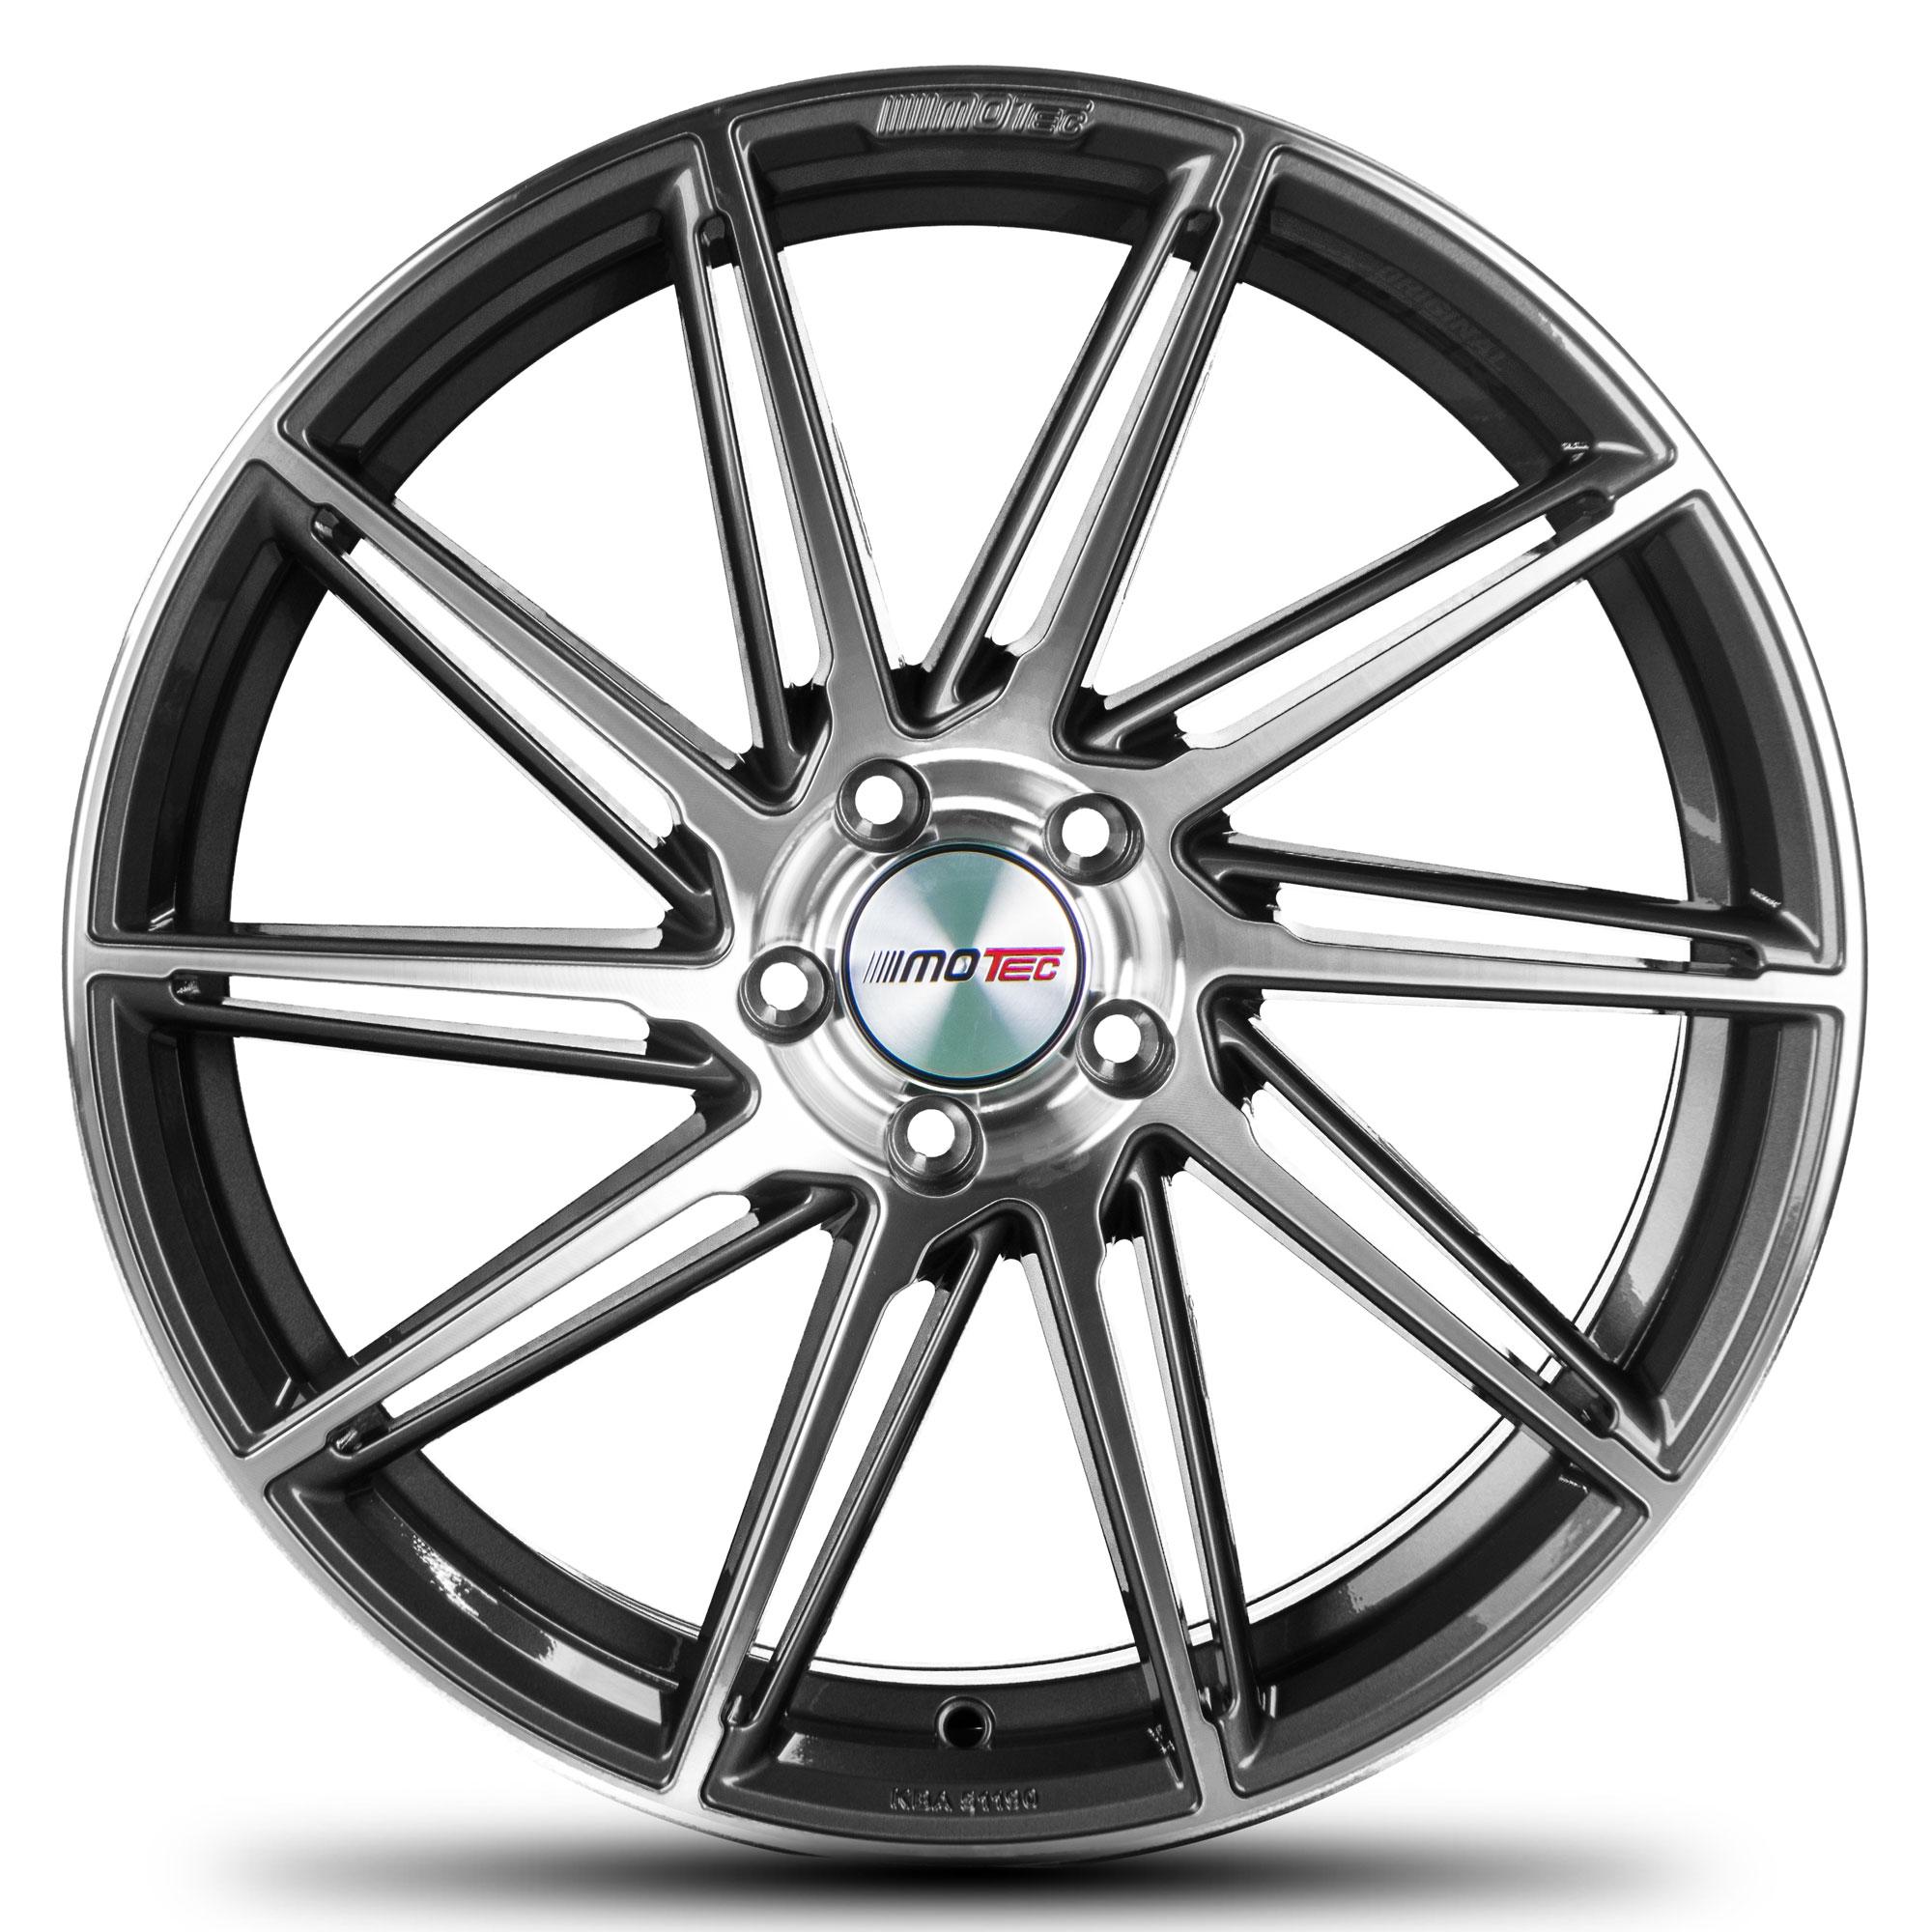 19 Inch Alloy Wheels For Audi A3 8v A4 S4 A5 S5 A6 A7 A8